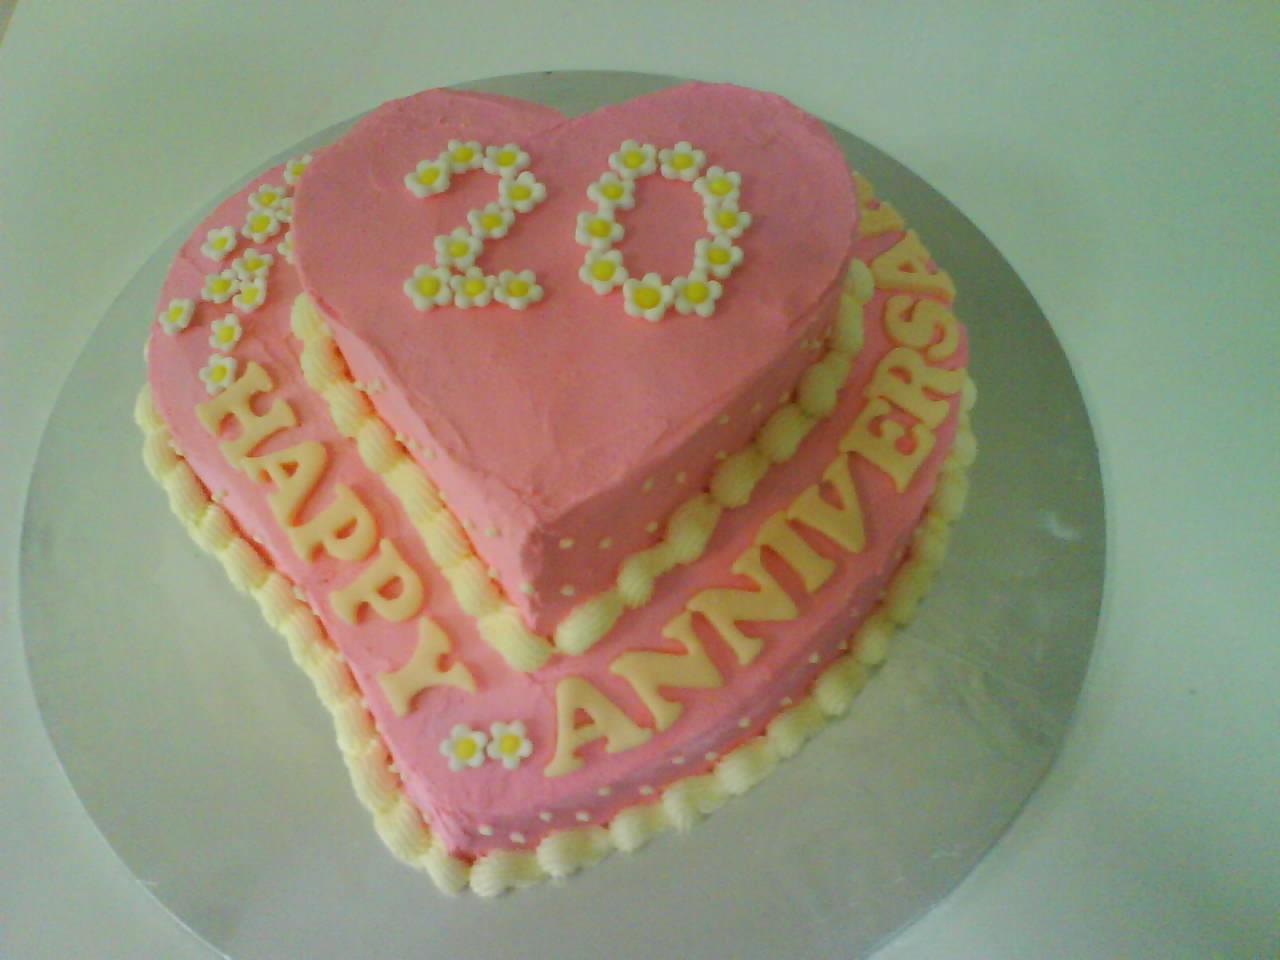 Happy Marriage Anniversary Mom Dad Cake Pics Many Hd Wallpaper